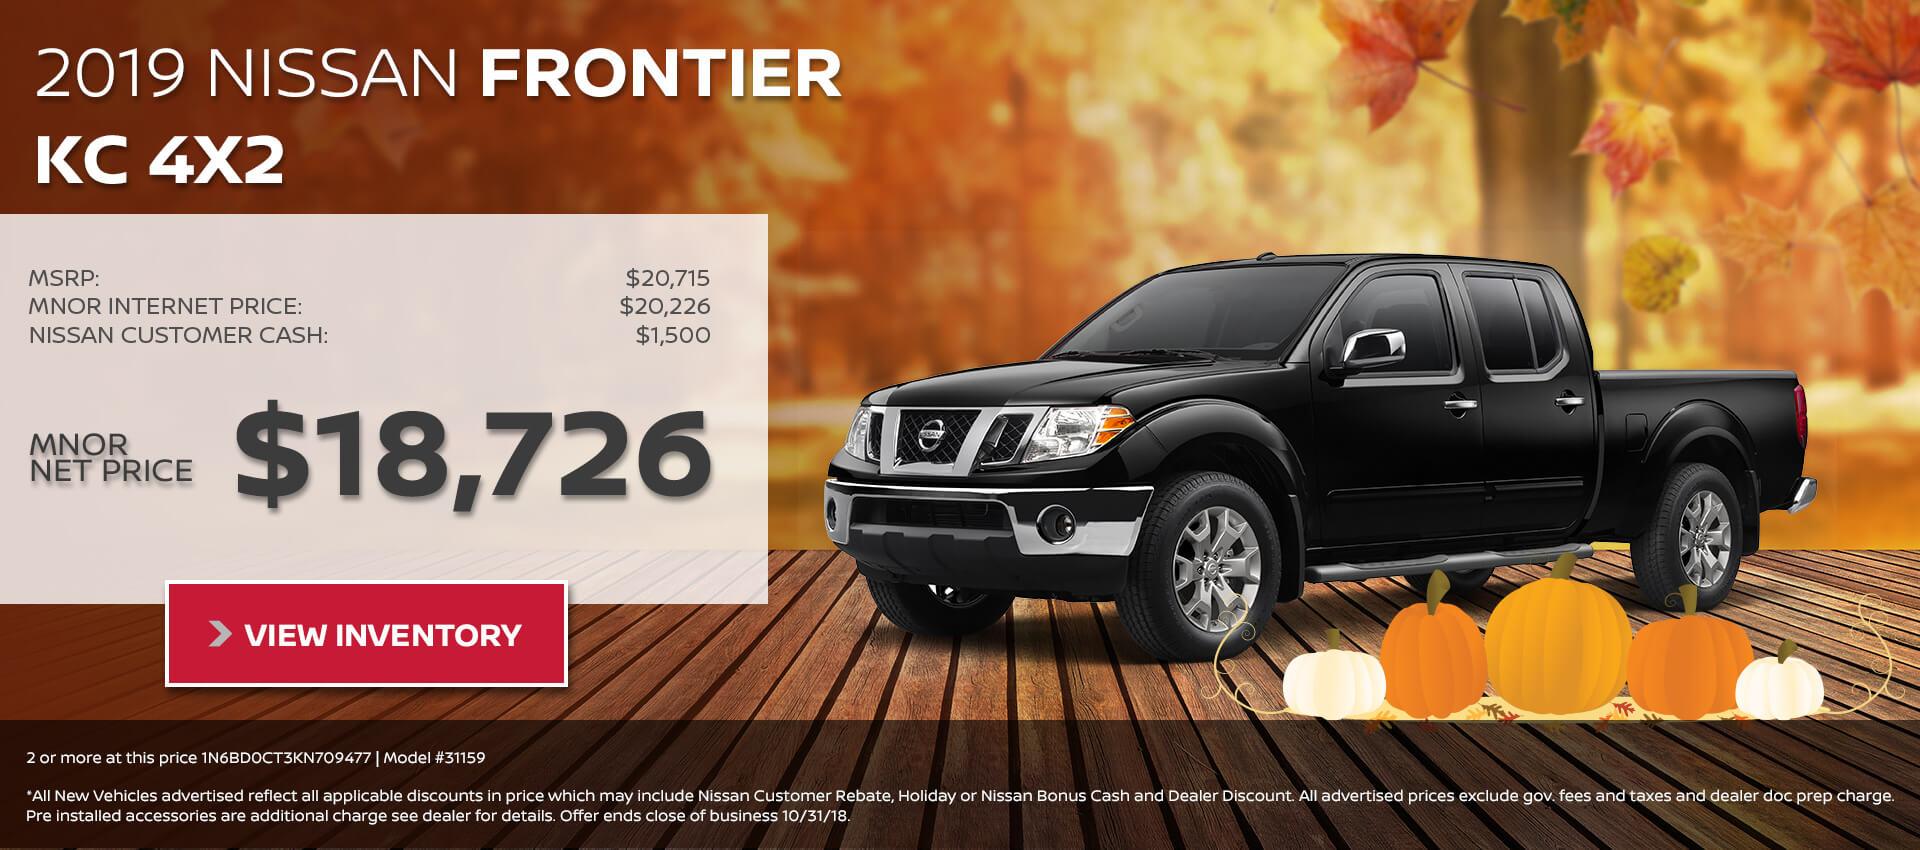 2019 Nissan Frontier KC $18,726